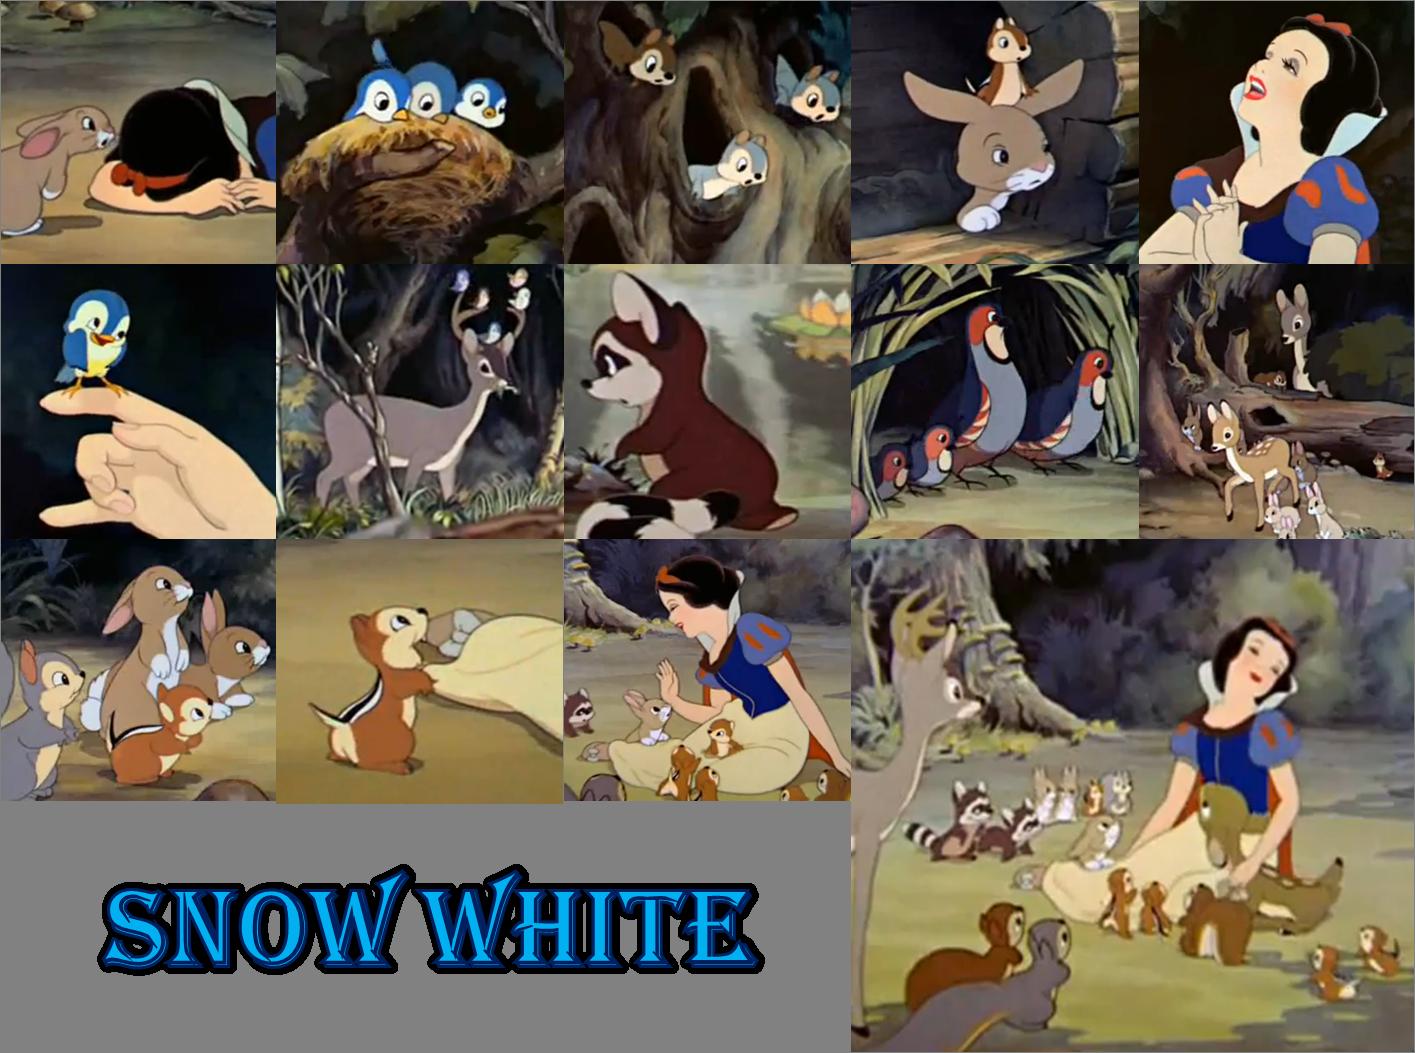 snow white with animals